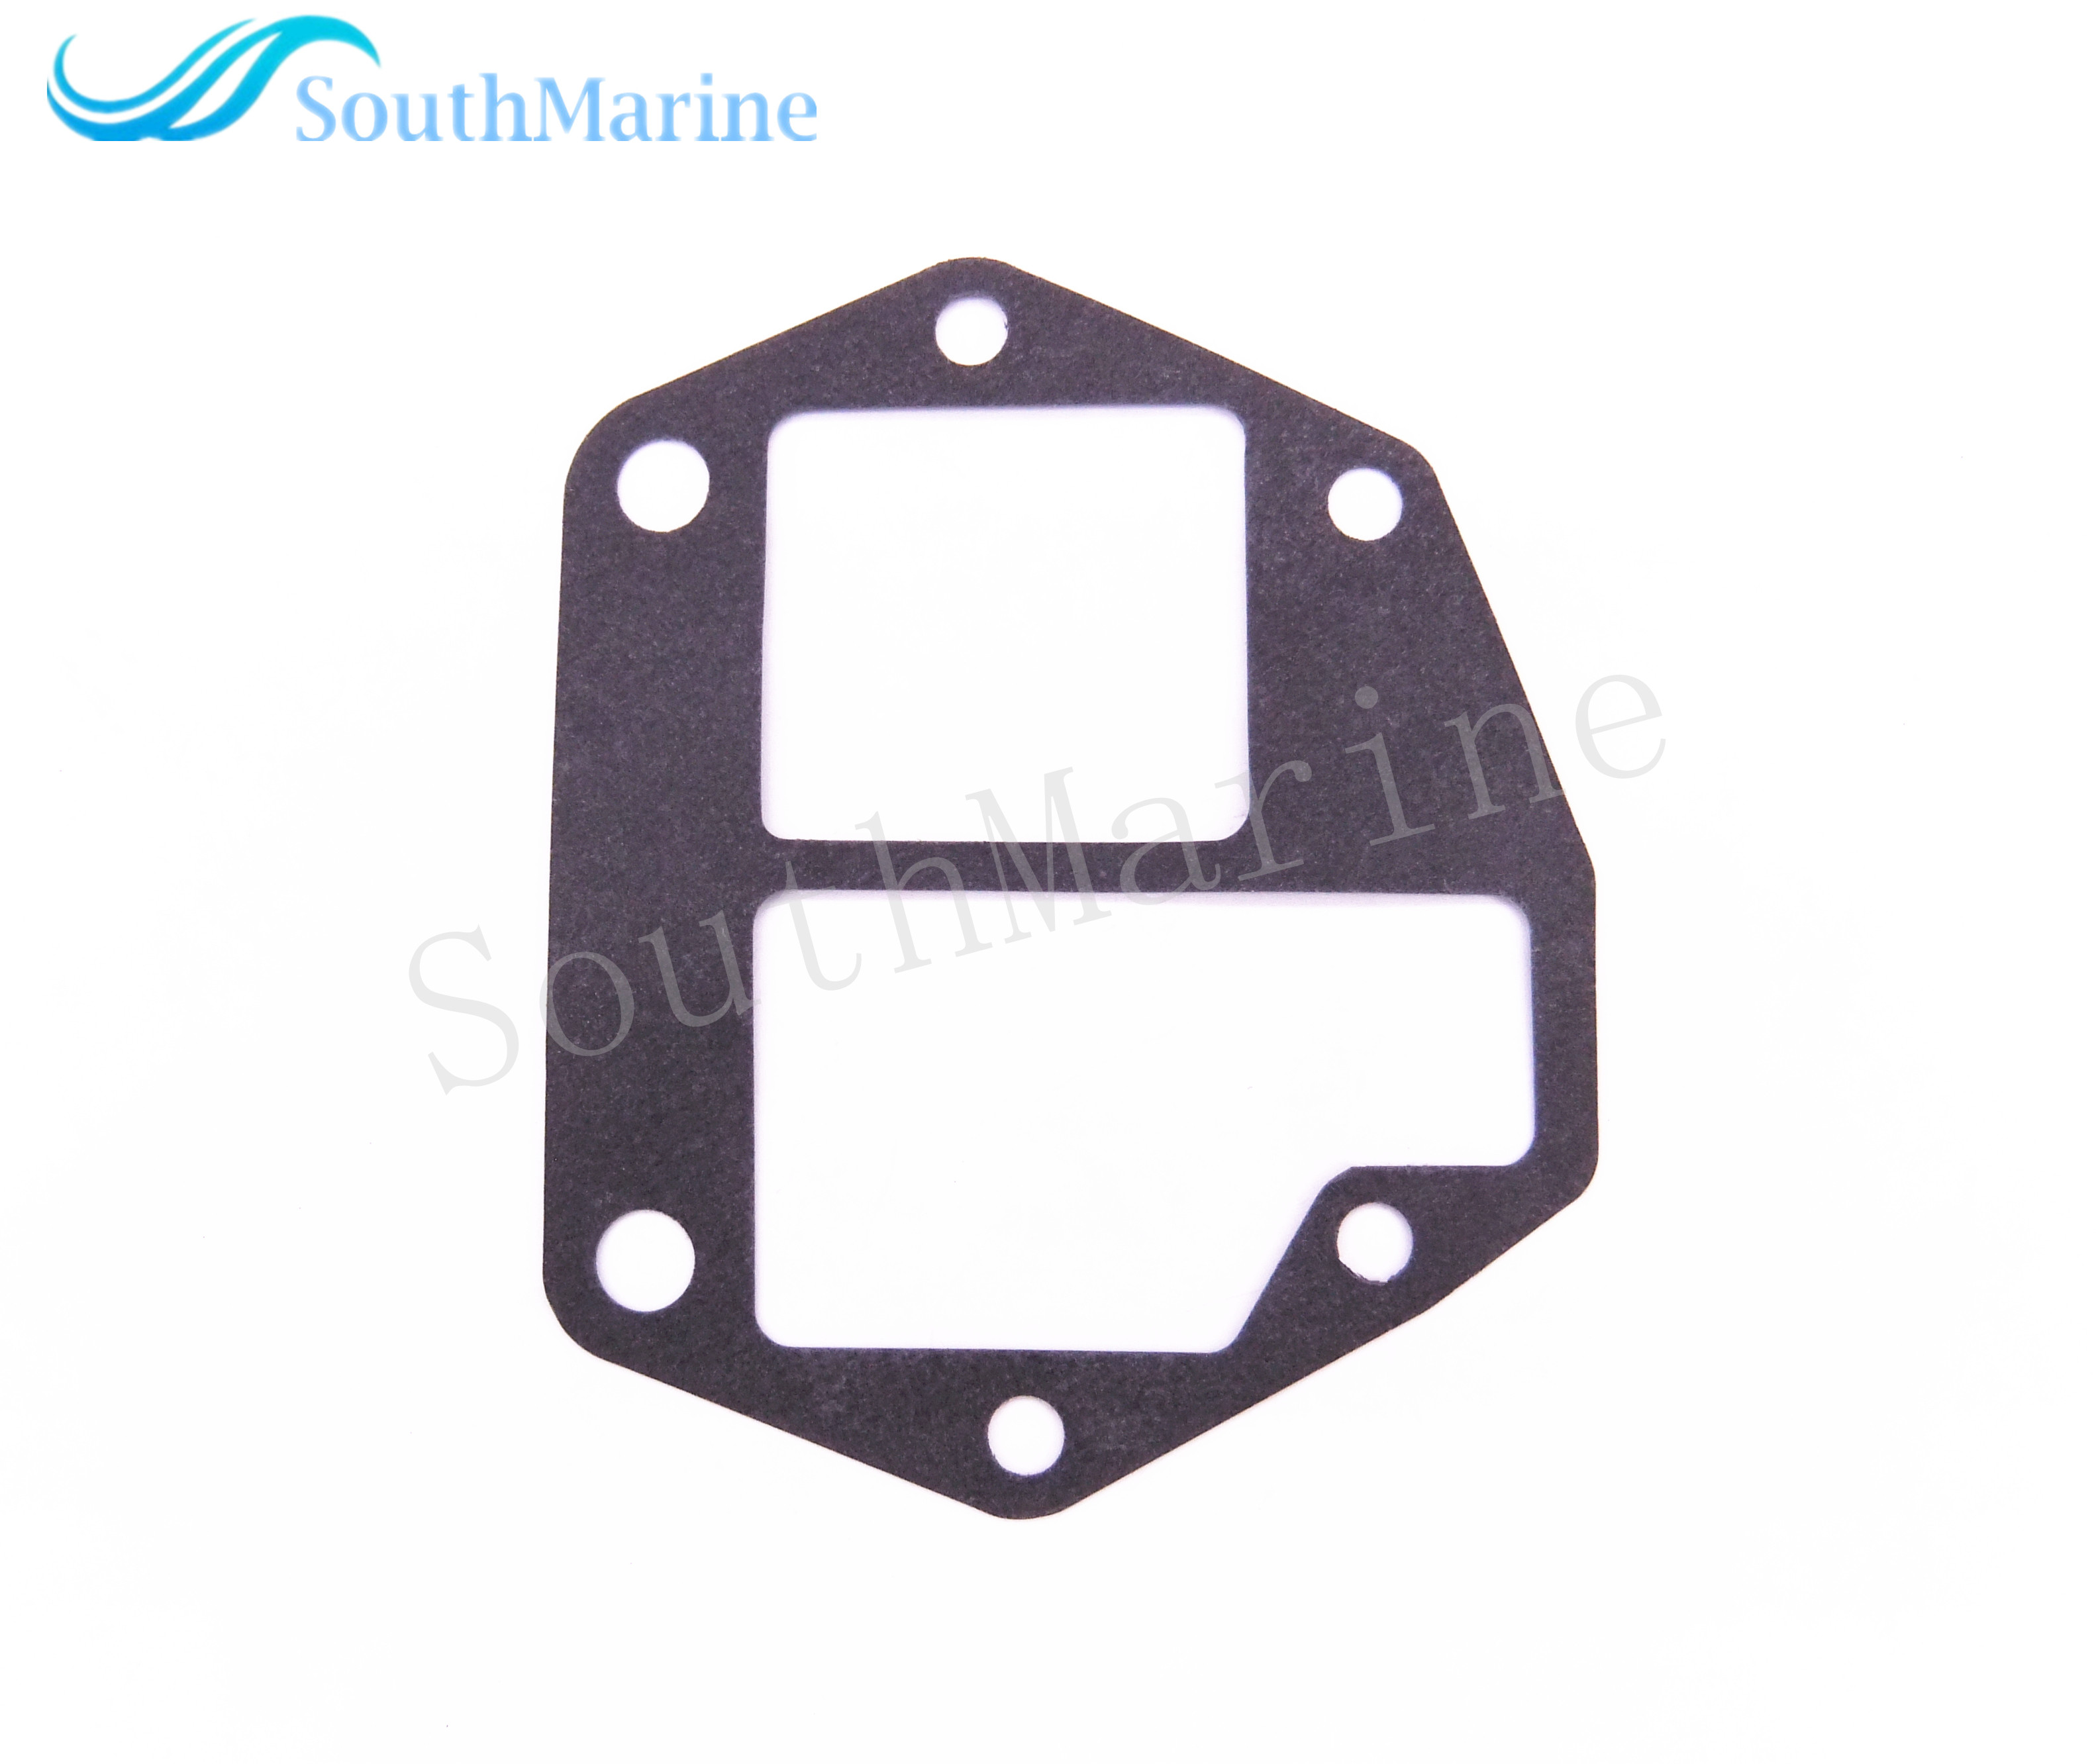 Boat Motor 9.8F-01.02.04 Inlet Manifold Inner Gasket for Hidea 2-Stroke 9.8F 8F 6F Outboard Engine